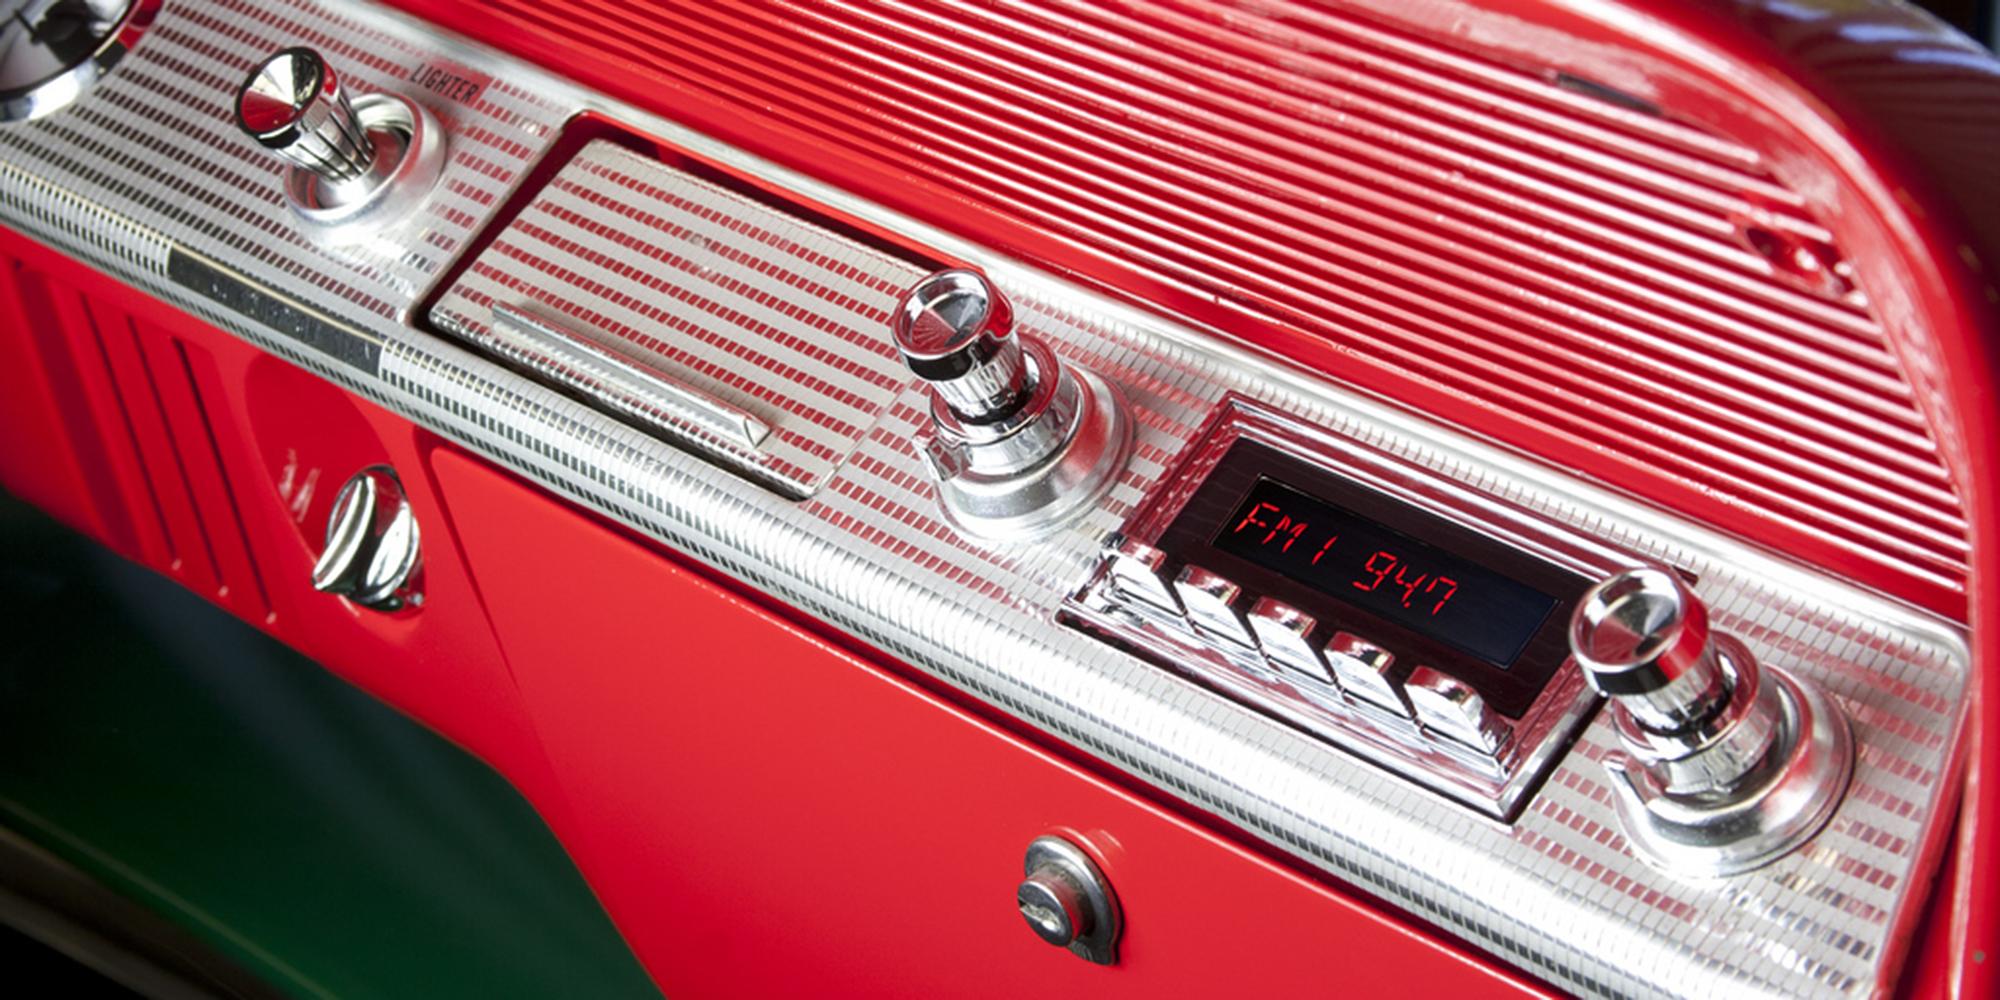 ars auto radio shop stuttgart autoradio und autolautsprecher. Black Bedroom Furniture Sets. Home Design Ideas